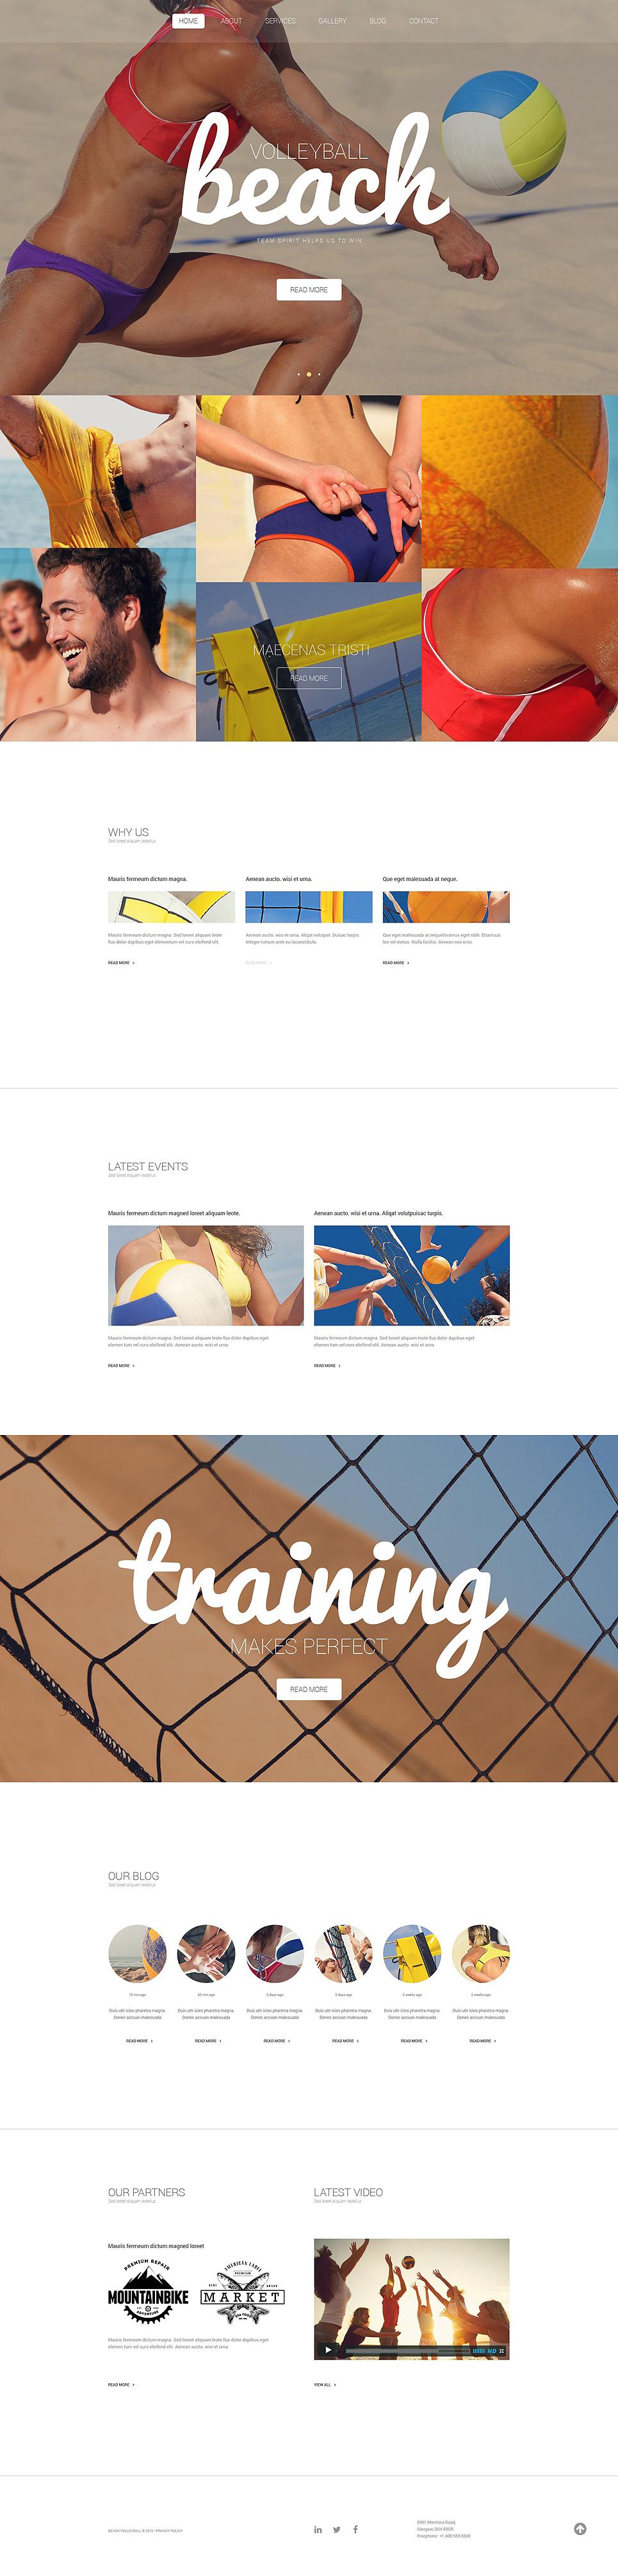 Адаптивный шаблон сайта на тему волейбол #54788